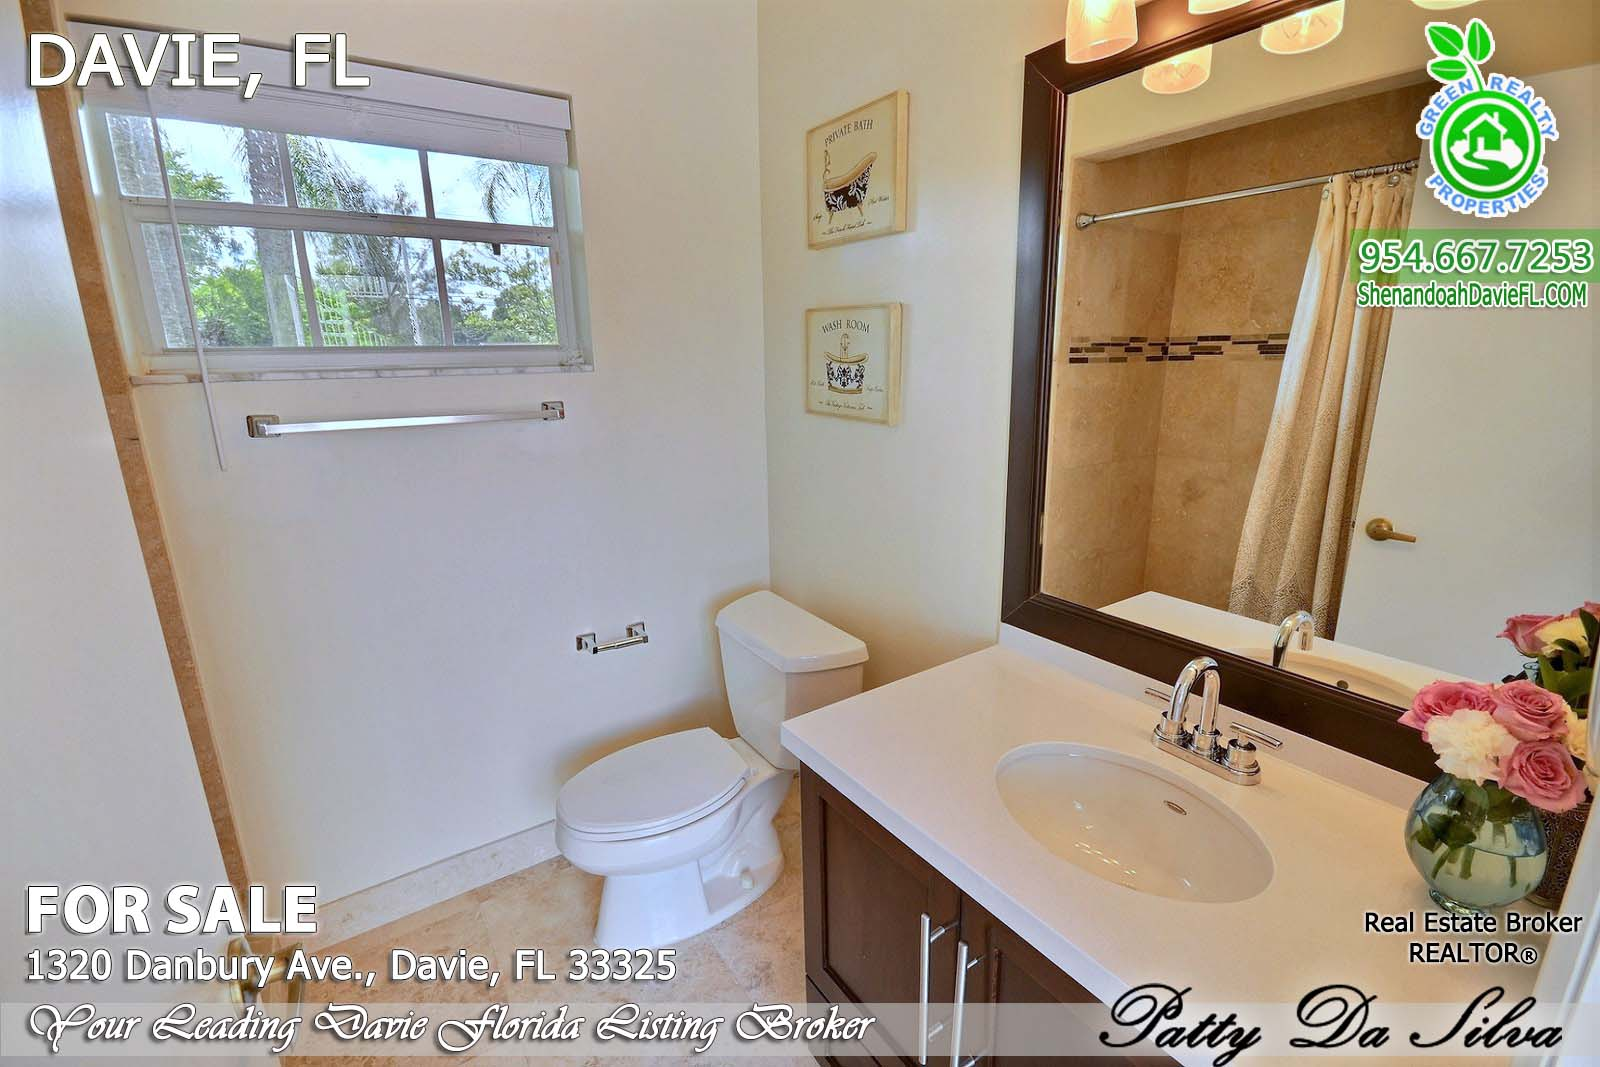 Davie Homes For Sale - 1320 Danbury Ave, Davie FL 33320 (61)